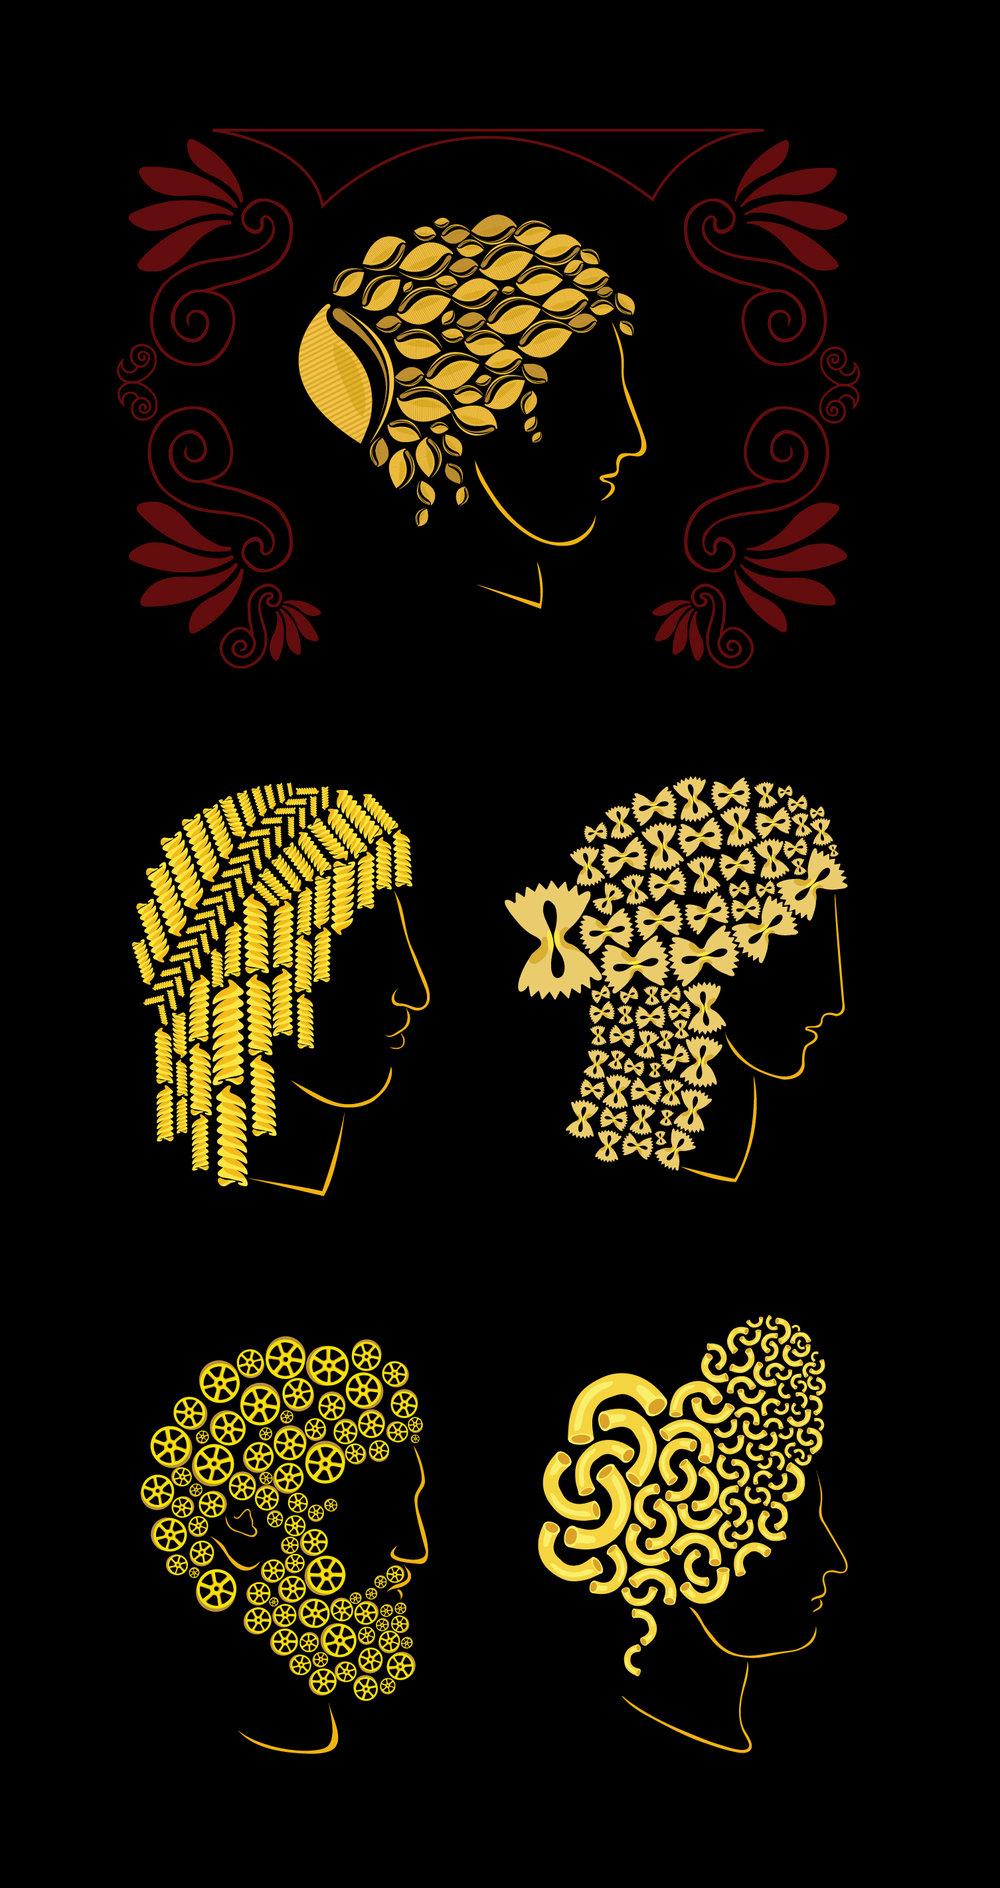 passein_illustrations_v2-01.jpg